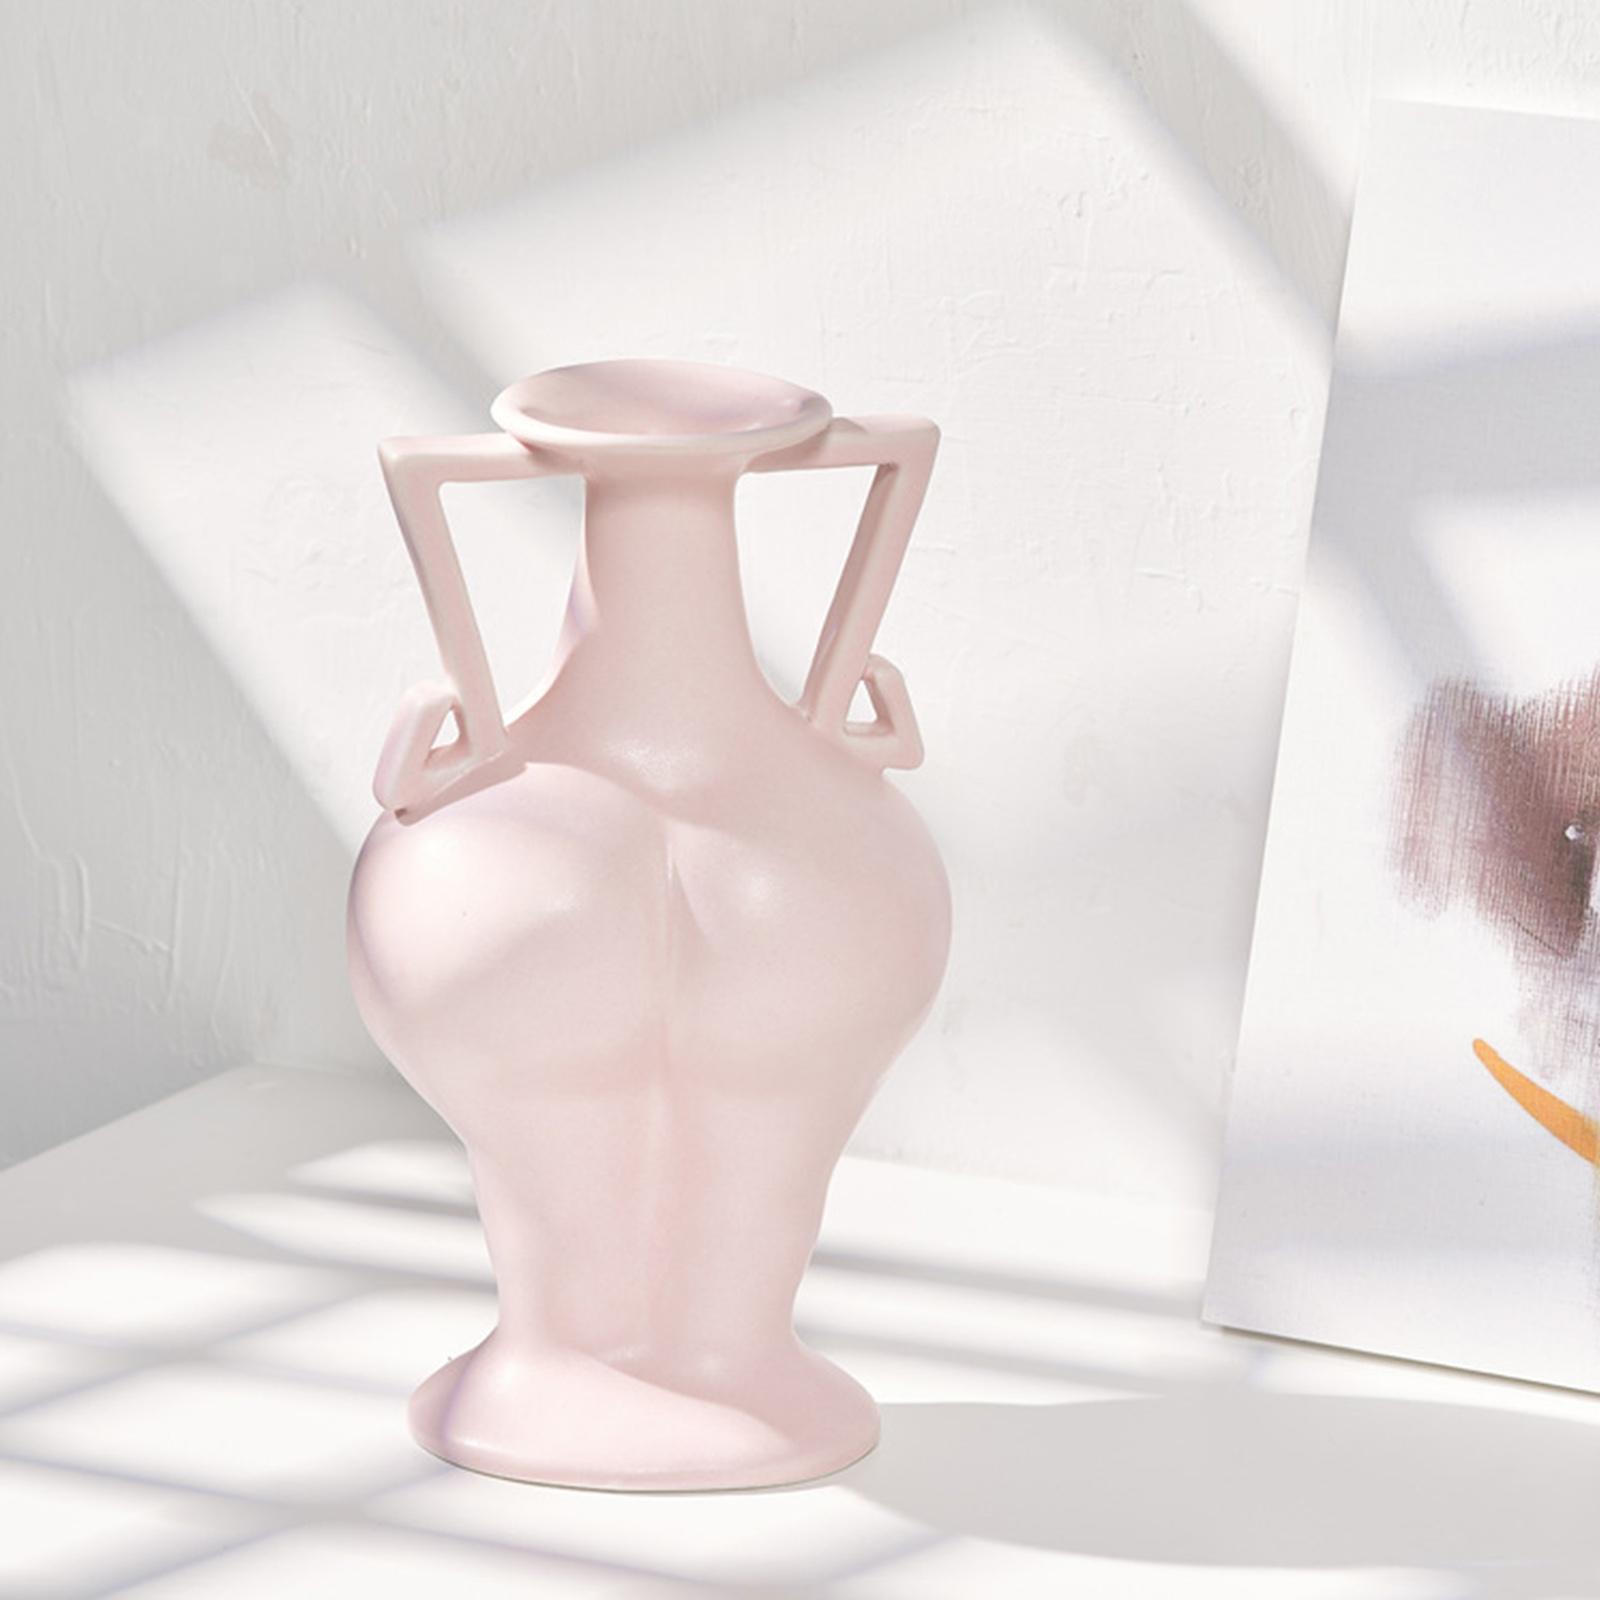 Indexbild 12 - Blumenvase Keramik Blumentöpfe Trockenblumenhalter Pflanzenvasen Wohnkultur